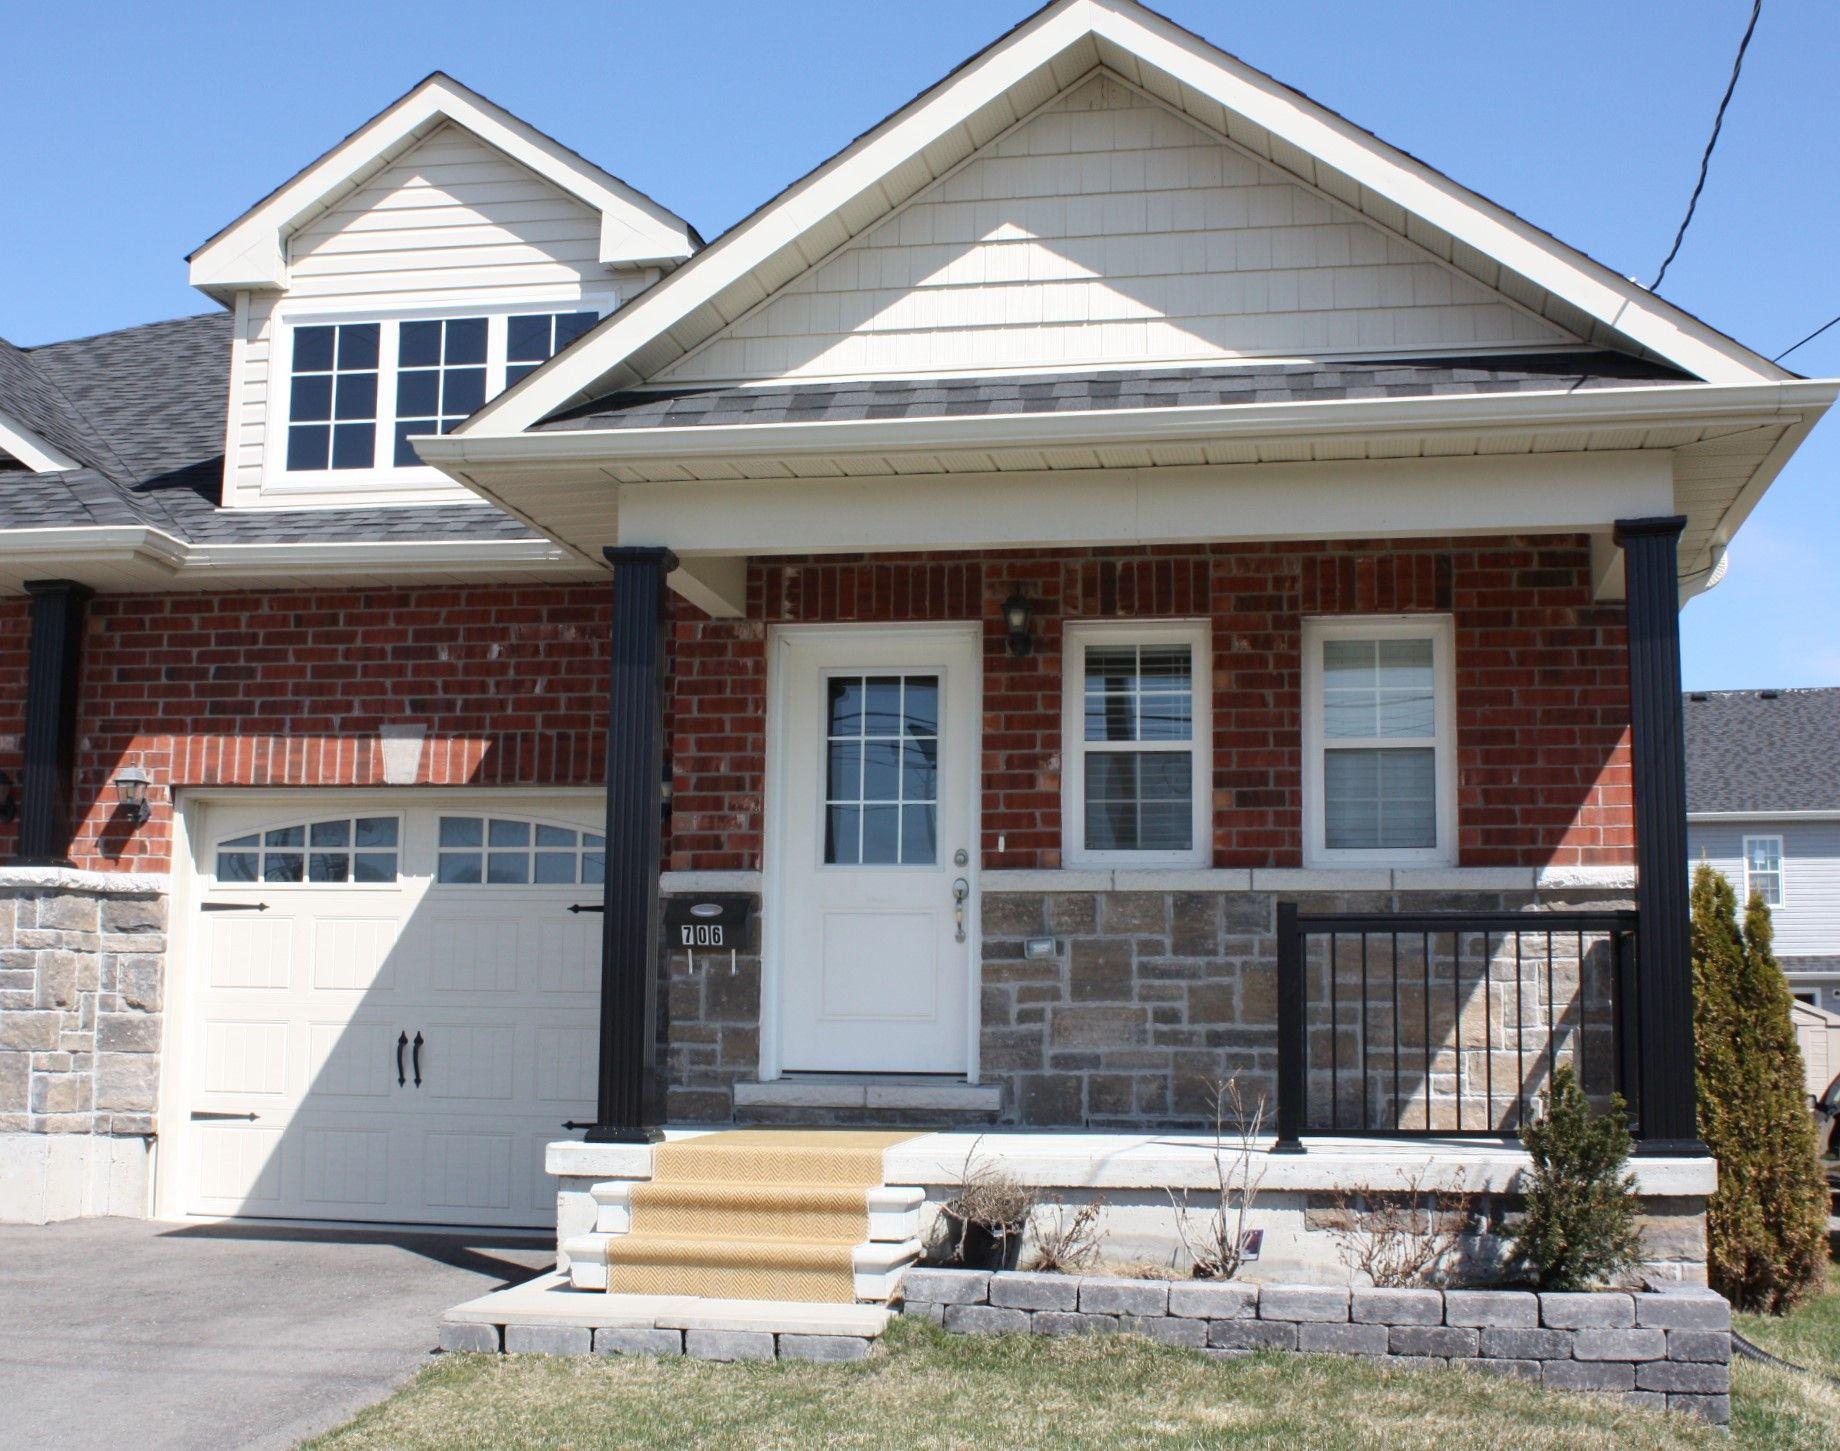 Main Photo: 706 Ontario Street in Cobourg: Condo for sale : MLS®# 254262